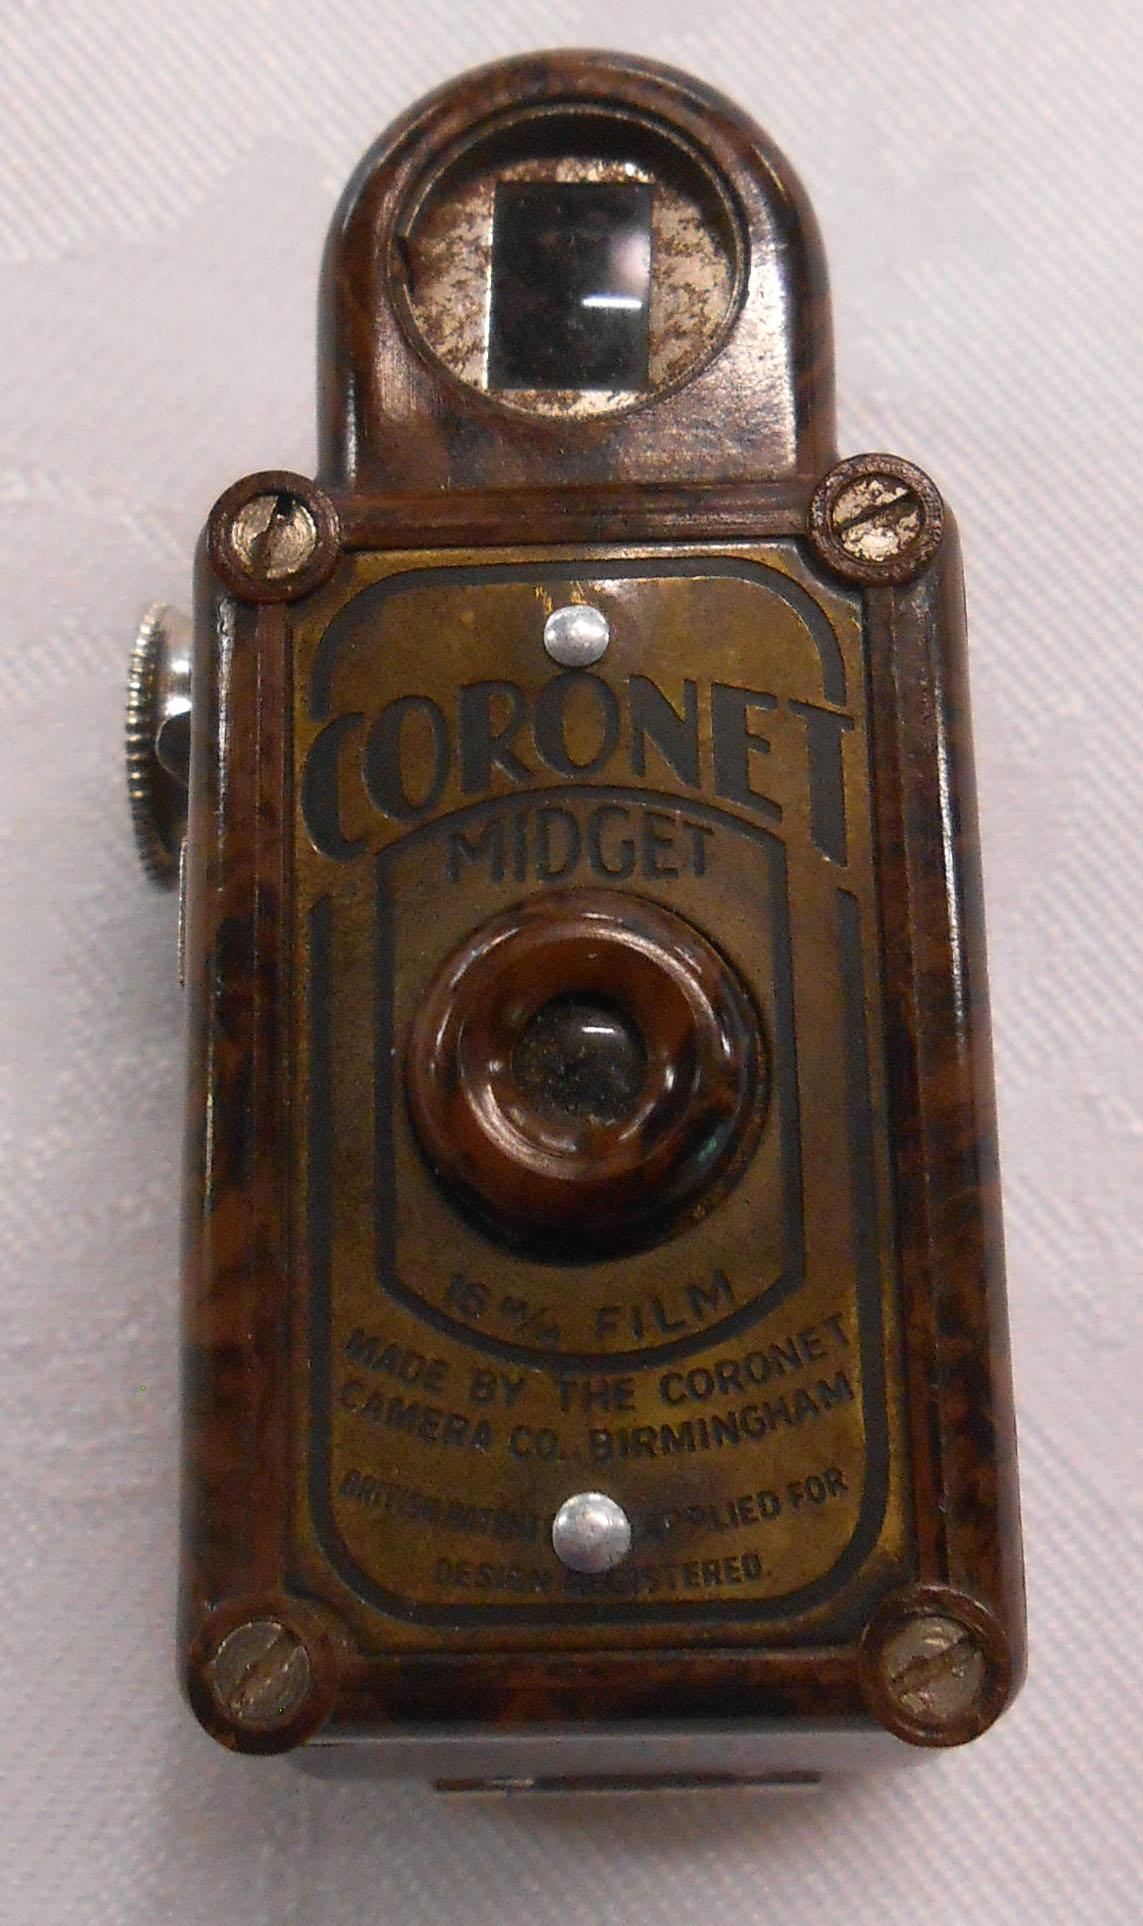 A vintage Coronet Midget miniature camera with brown Bakelite case